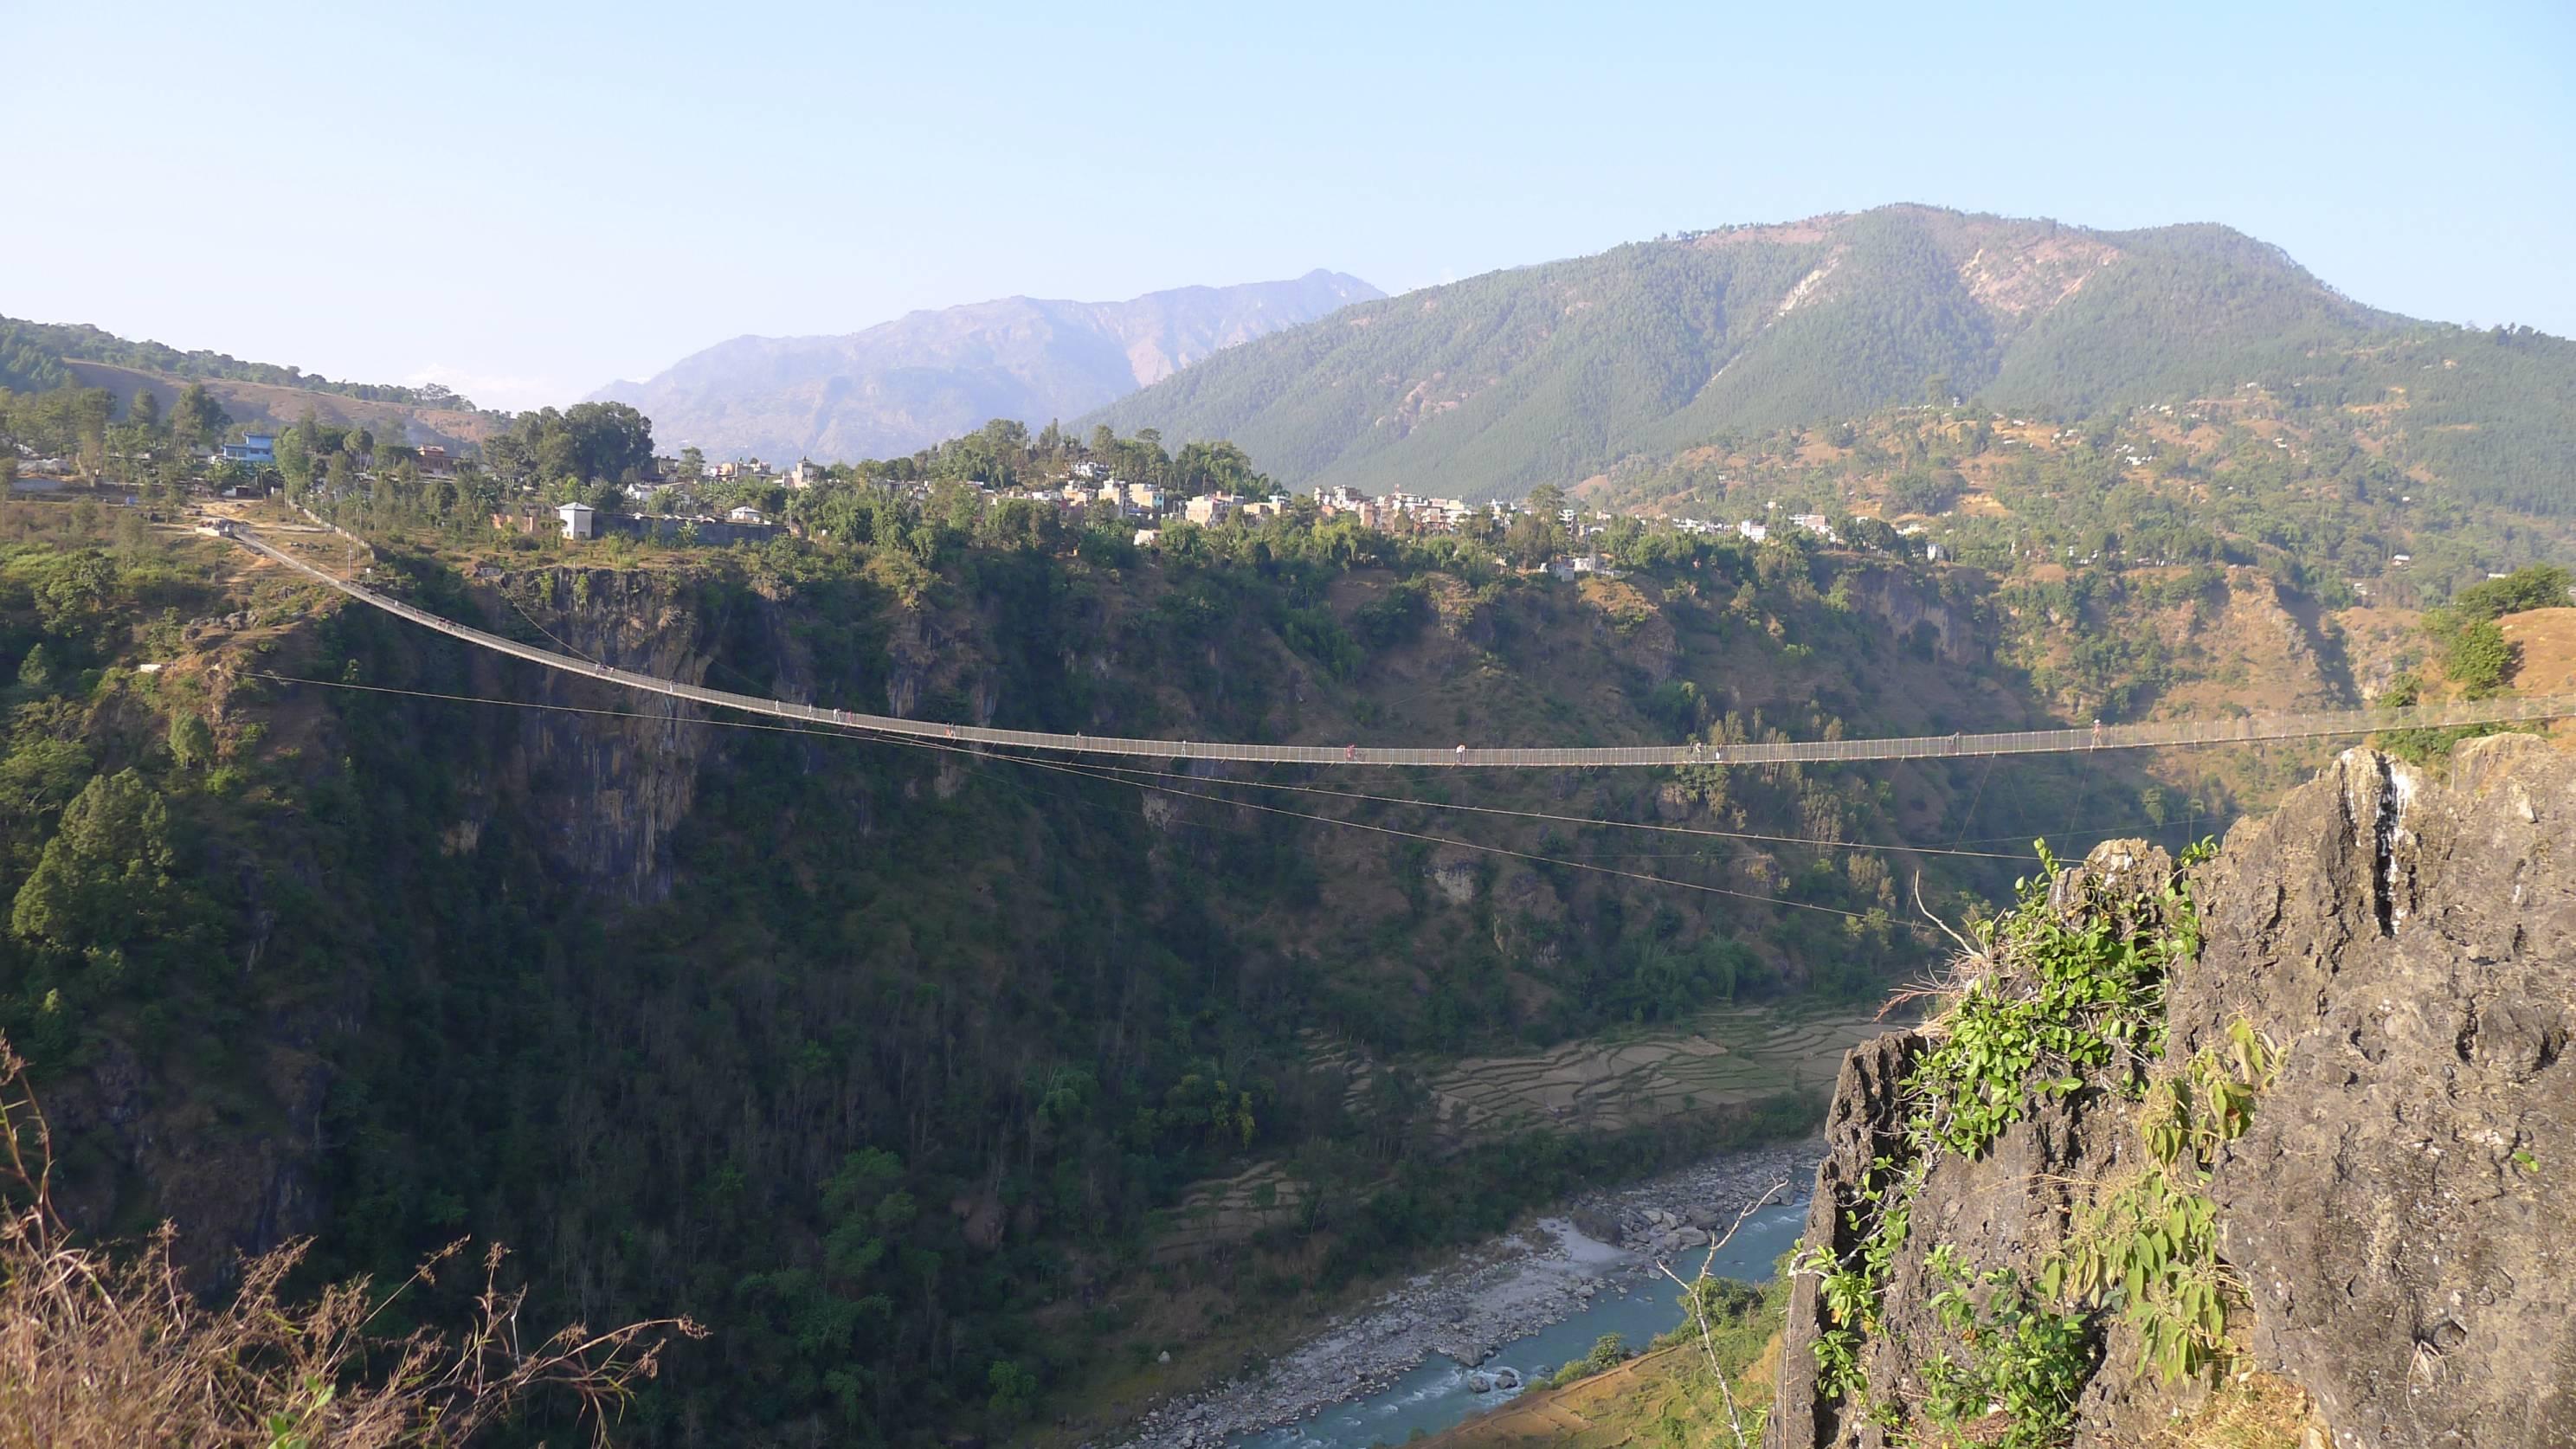 Kushma-Gyadi-Trail-Bridge,-Parbat,-The-Bridge-with-Highest-Free-Board